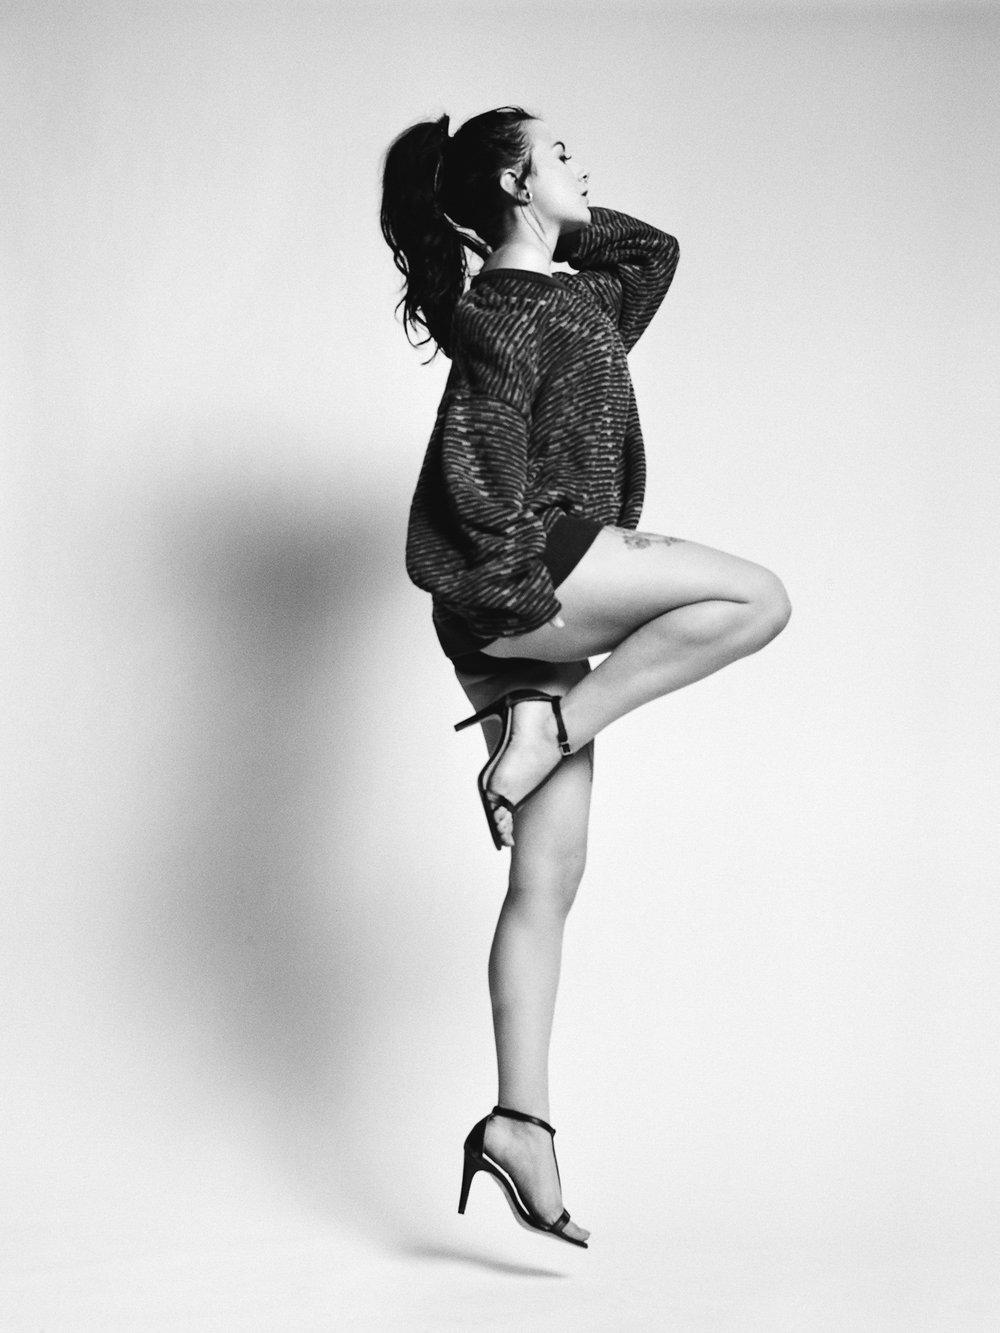 black-ponytail-heels-jump-photography-session